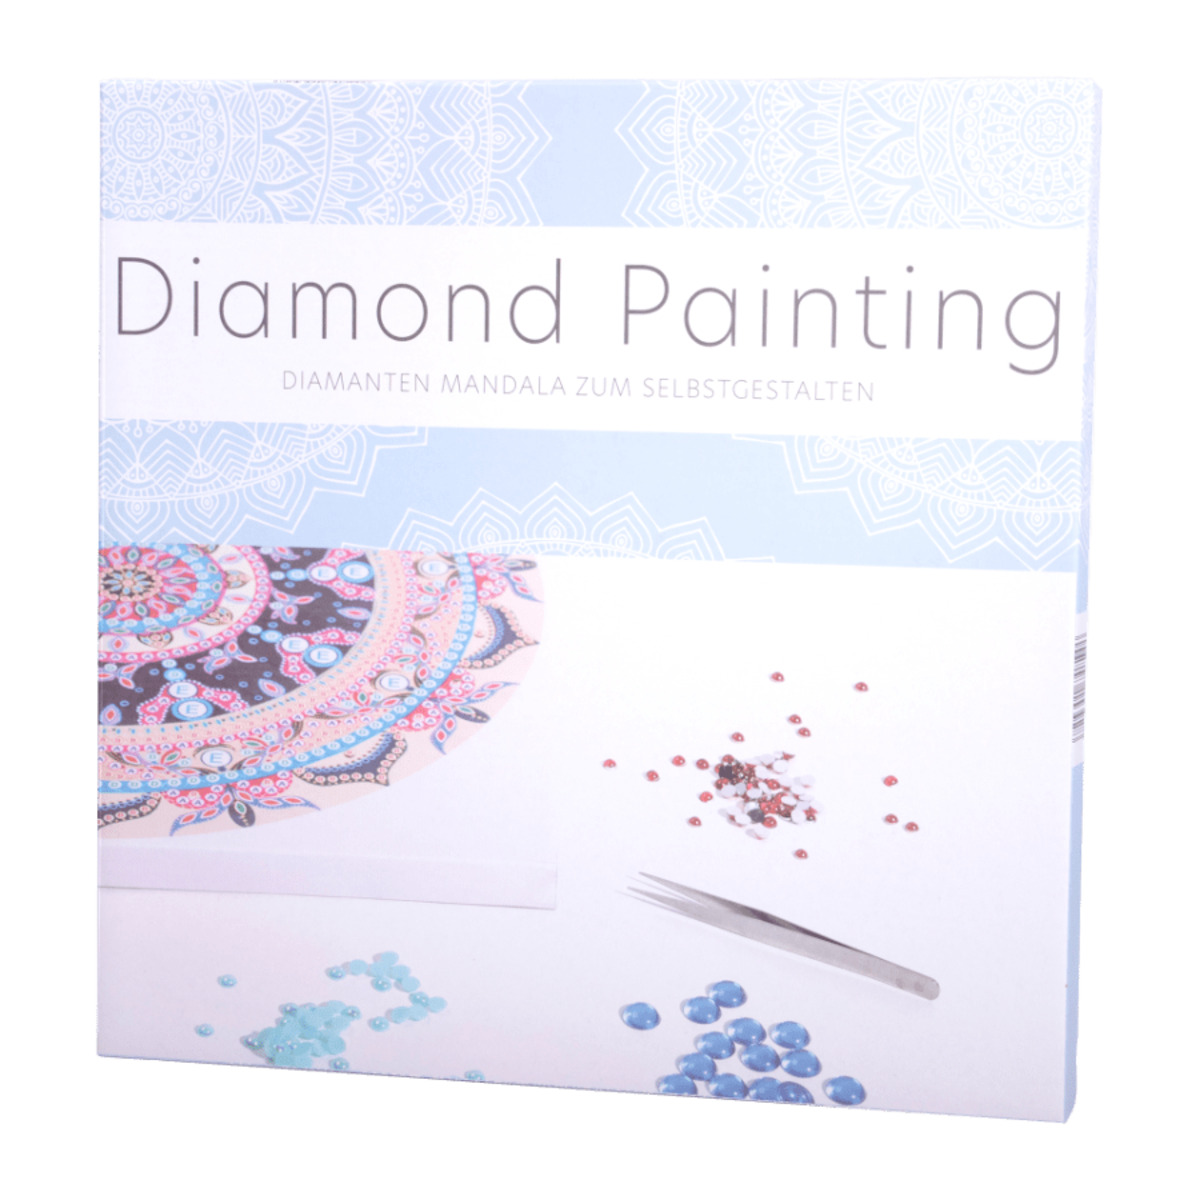 Bild 2 von Diamond Painting